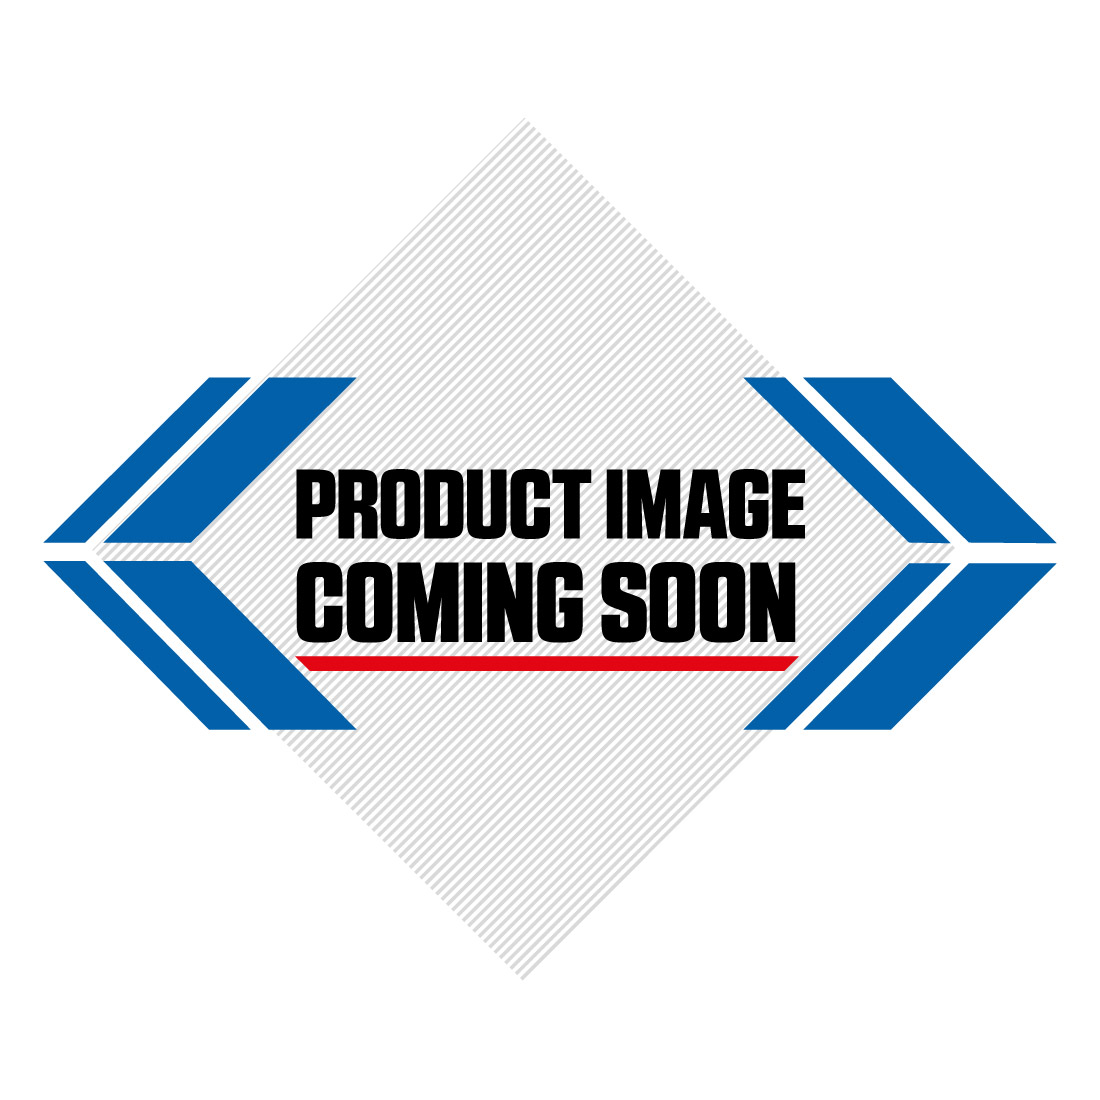 Suzuki Plastic Kit RMZ 450 (2013) OEM Factory Image-5